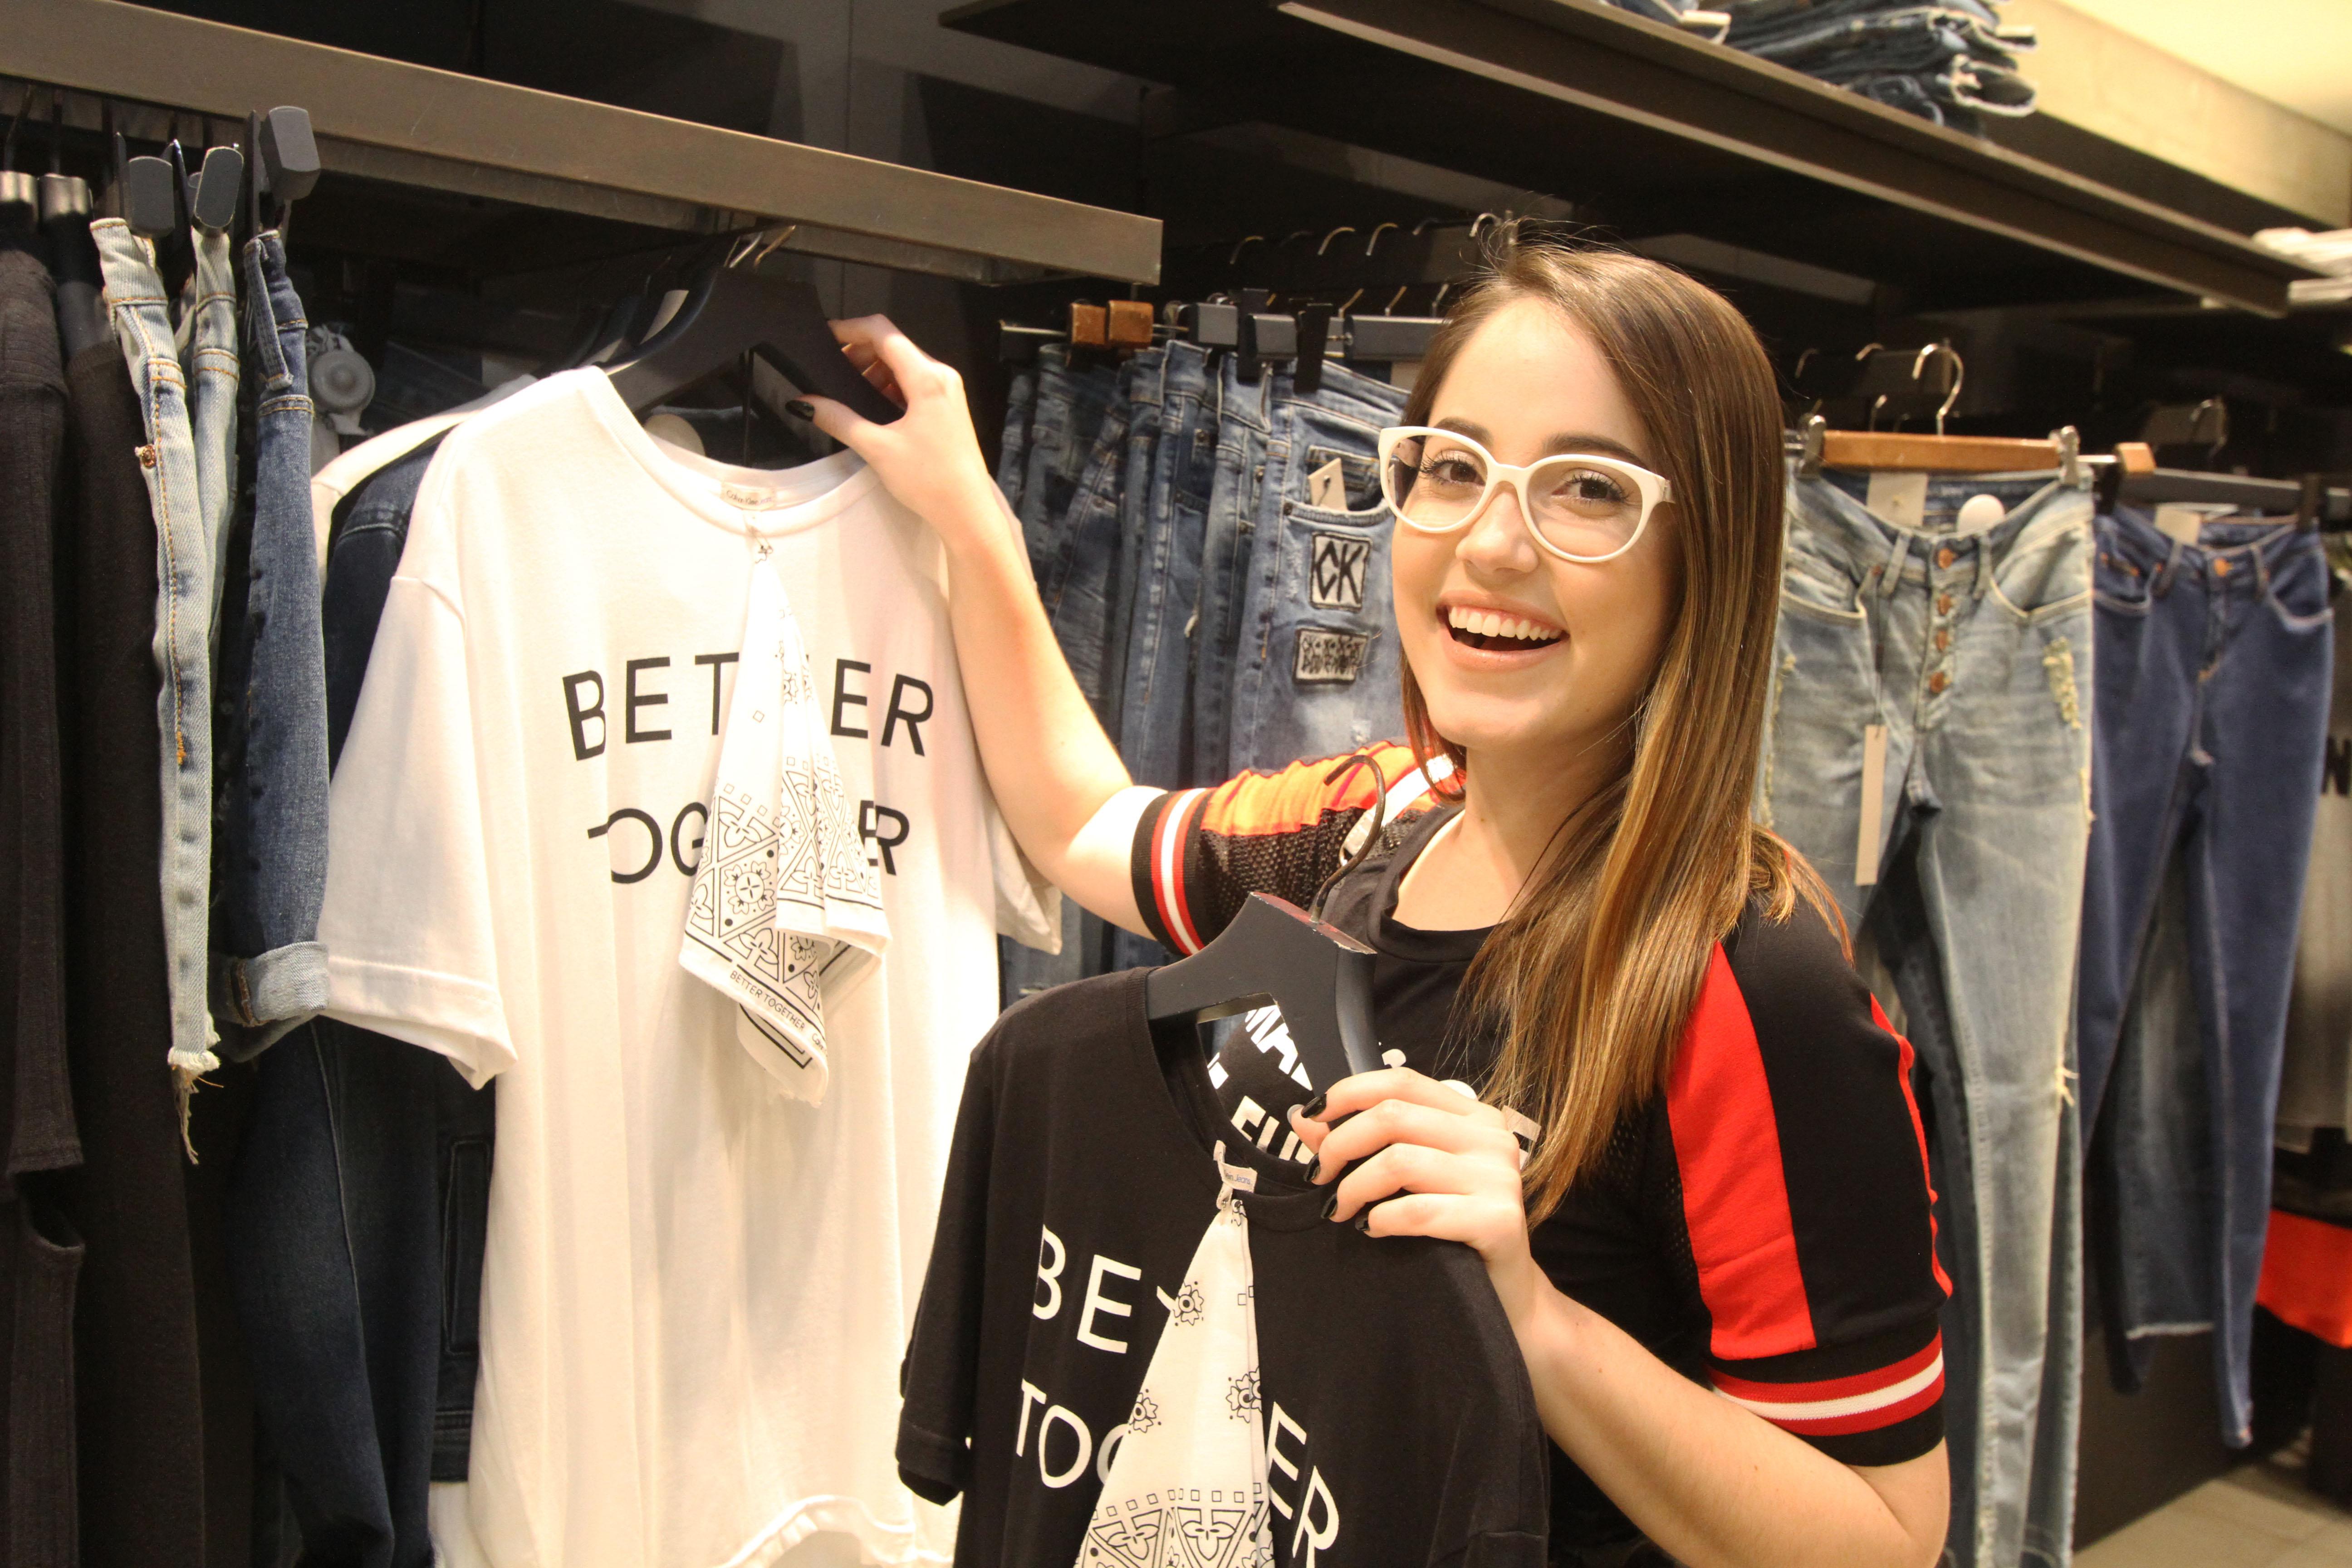 Karine Filizola circulou pelo Shopping Tacaruna para escolher presentes para o Dia dos Namorados - Crédito: Nando Chiappetta/DP